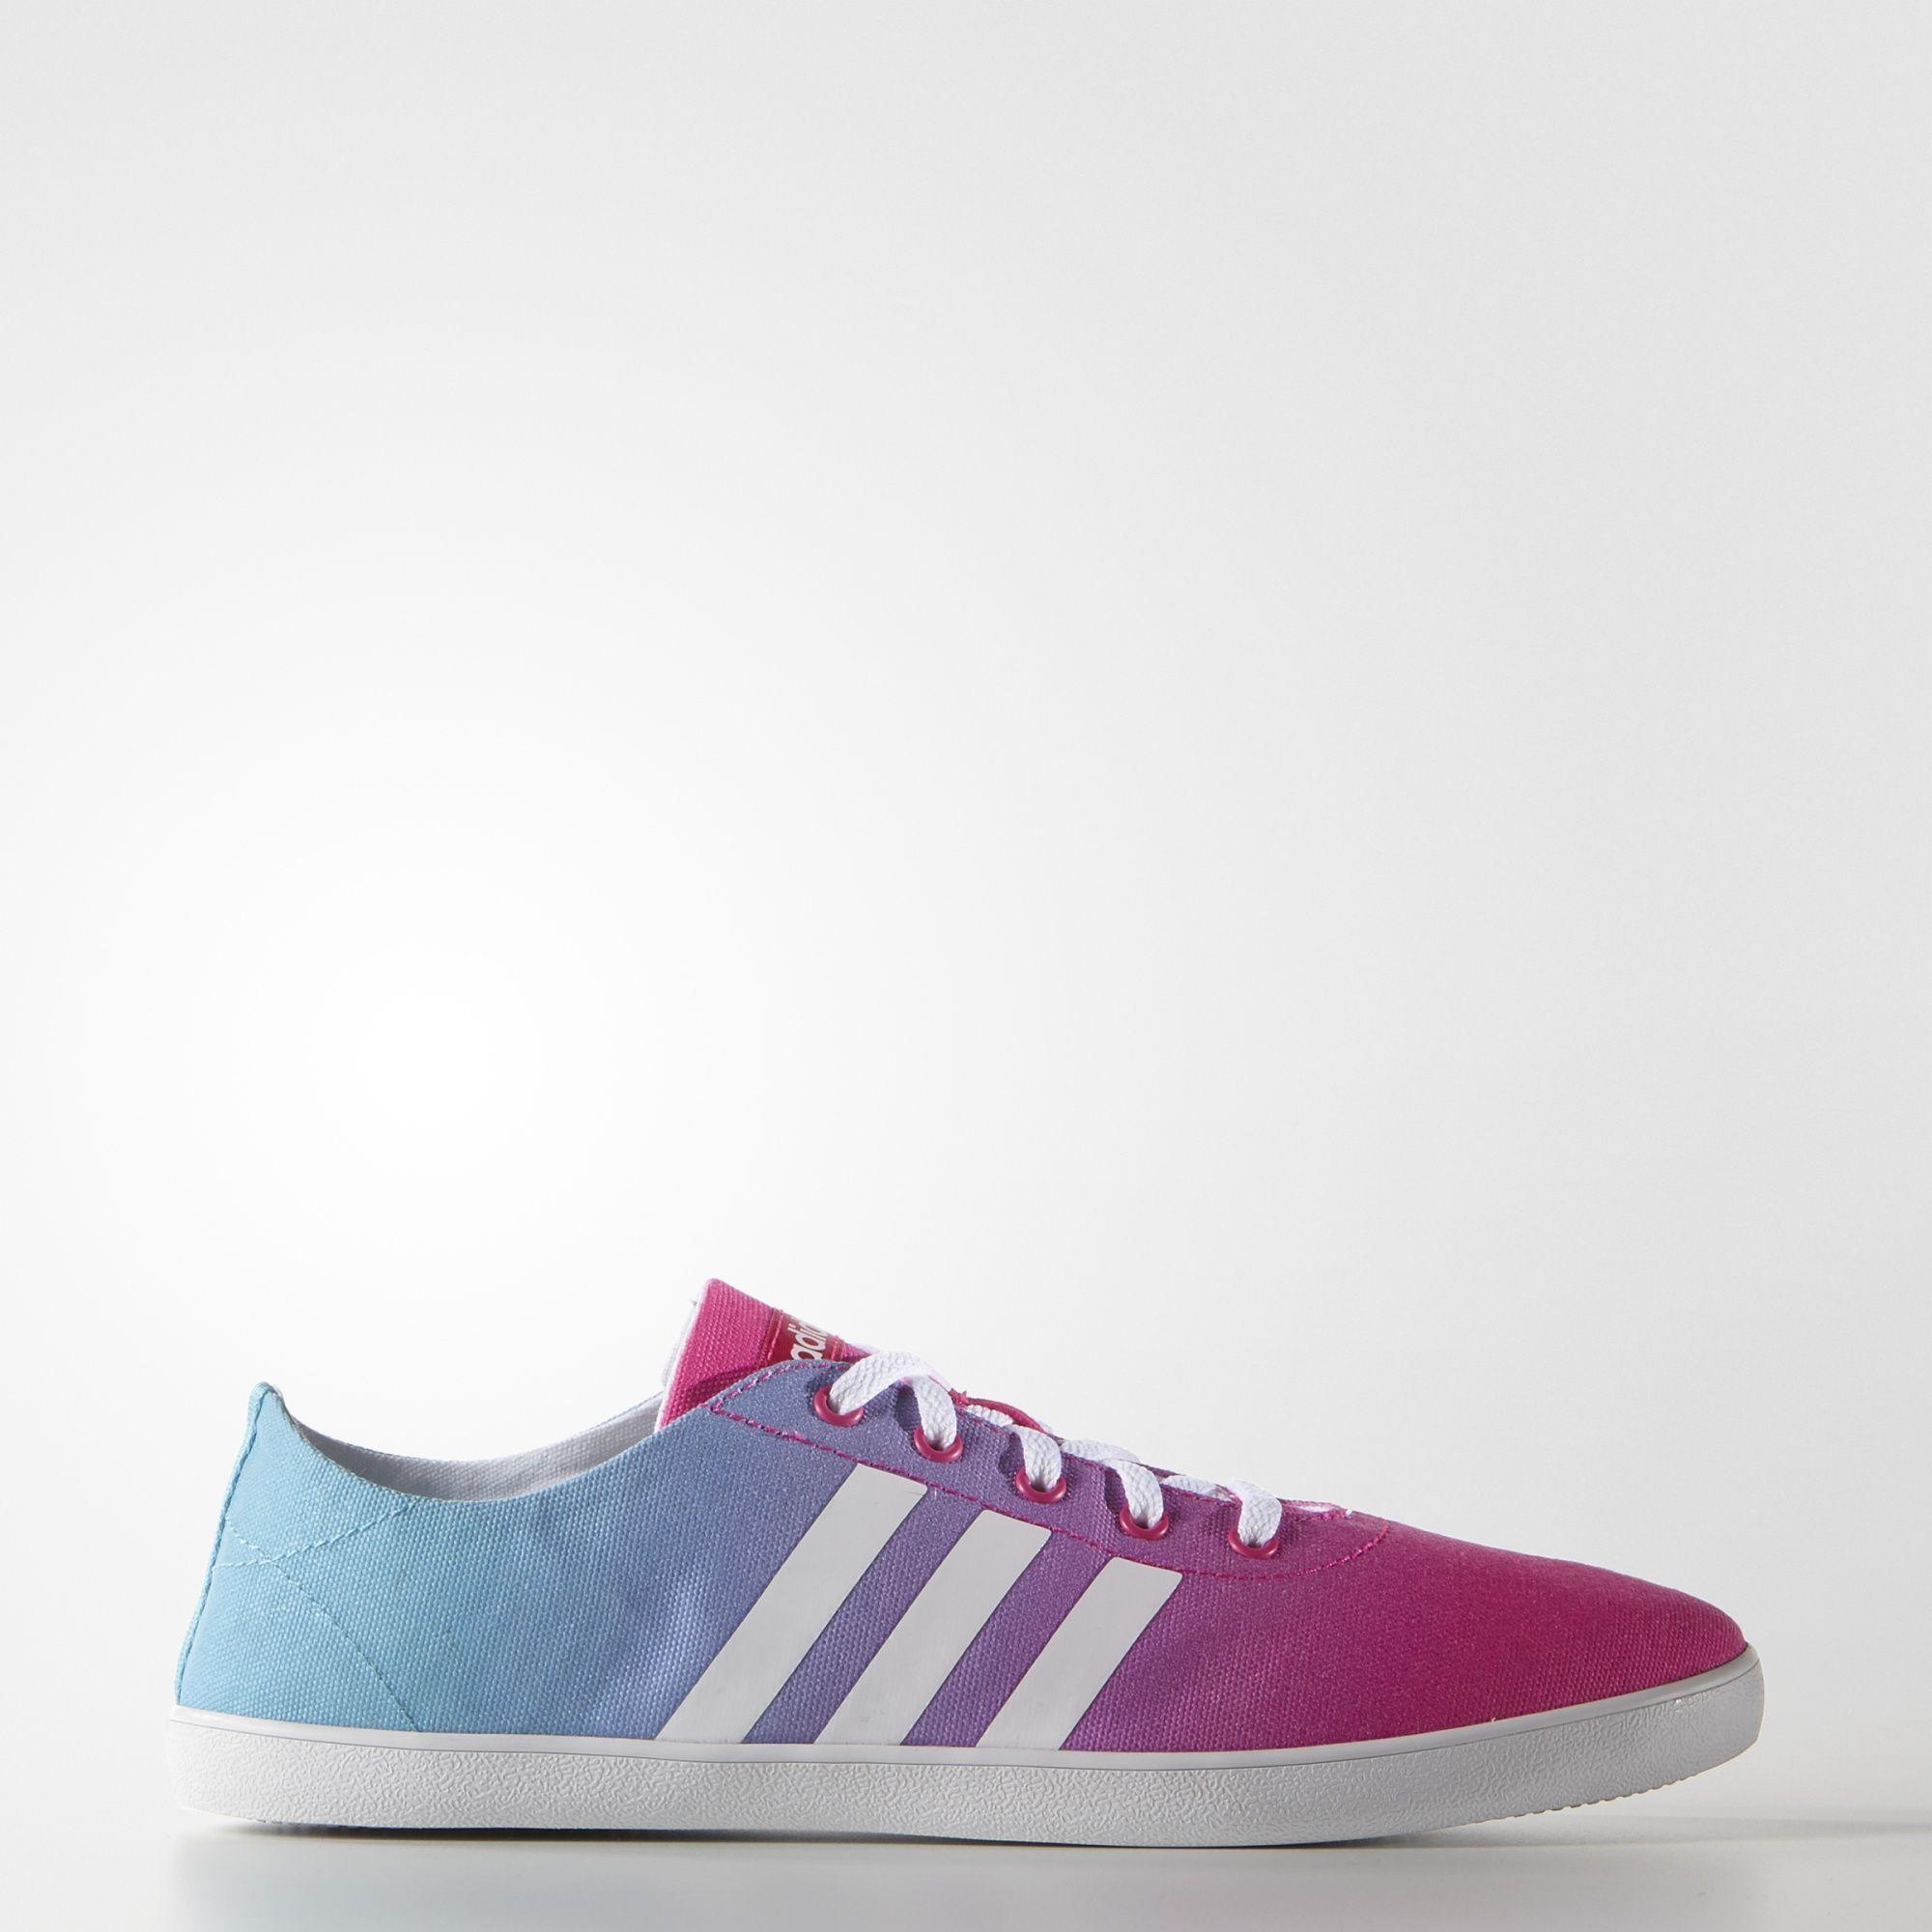 newest 4453e 6167a adidas neo - VS QT Vulc Schuh 44,95 EUR